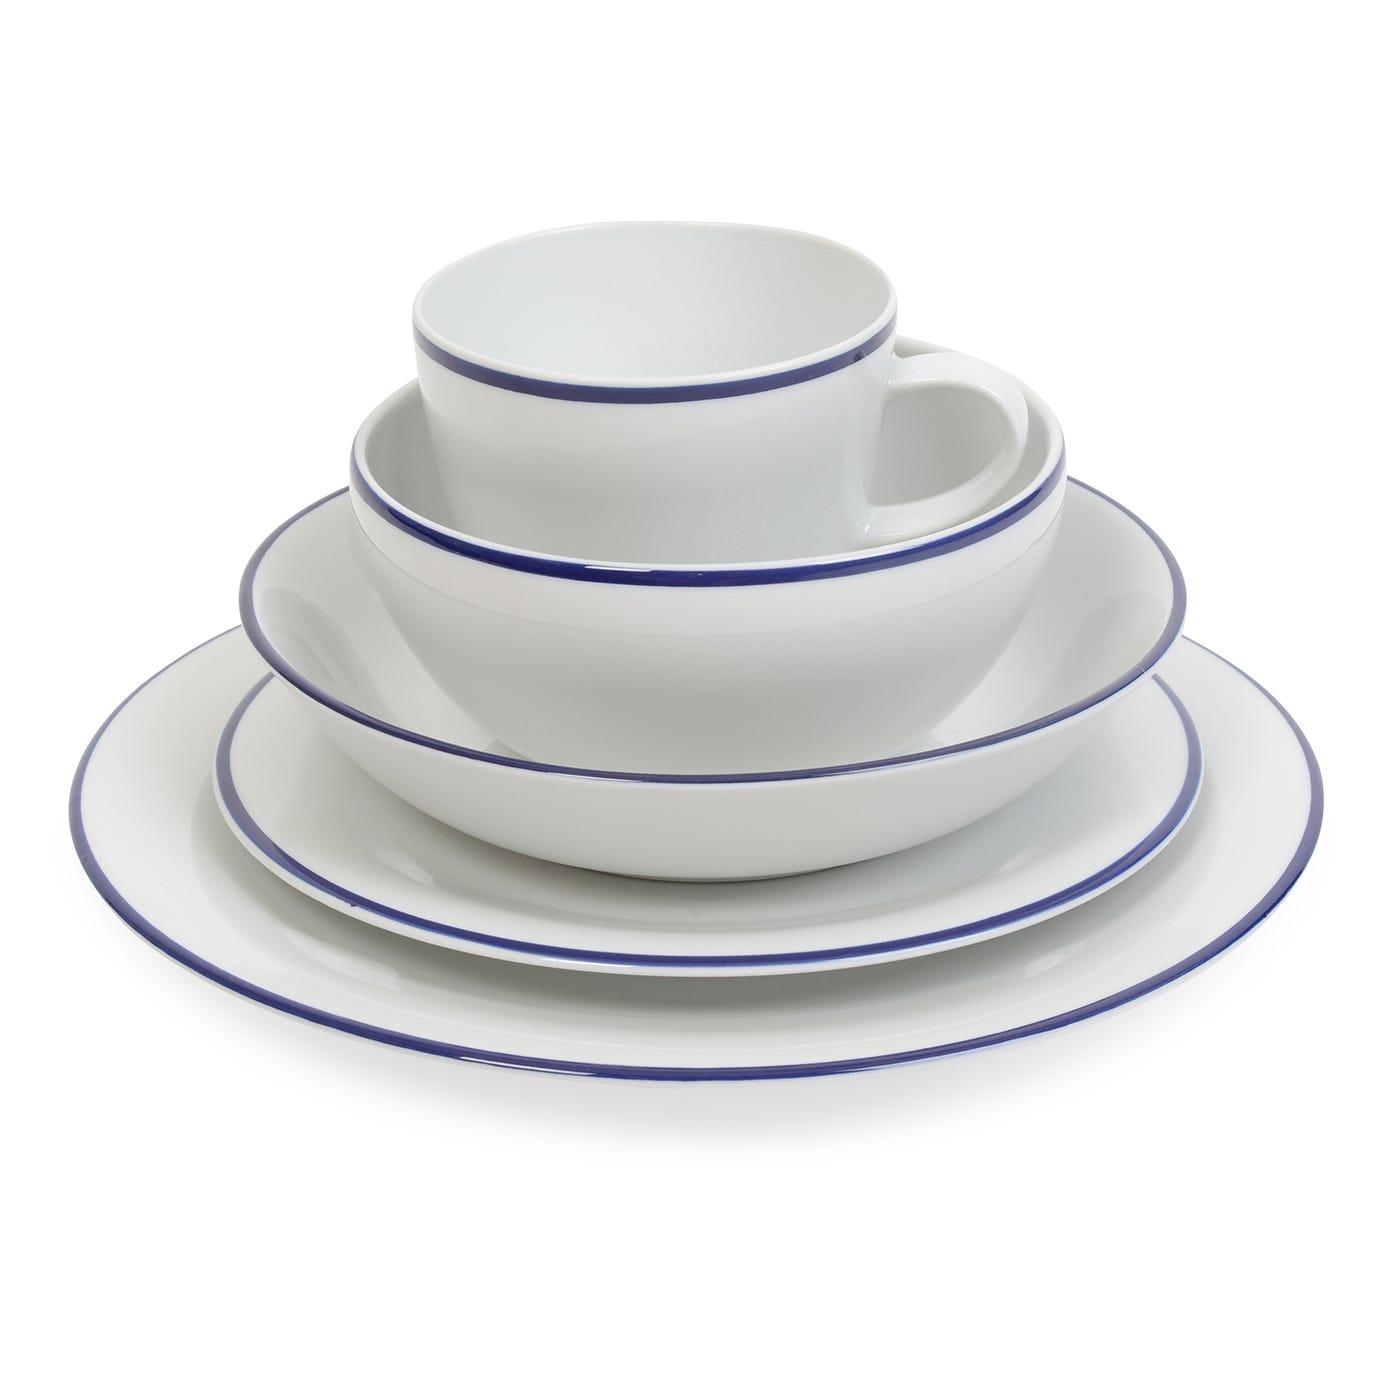 Seamless Blue Rim Dessert Plate